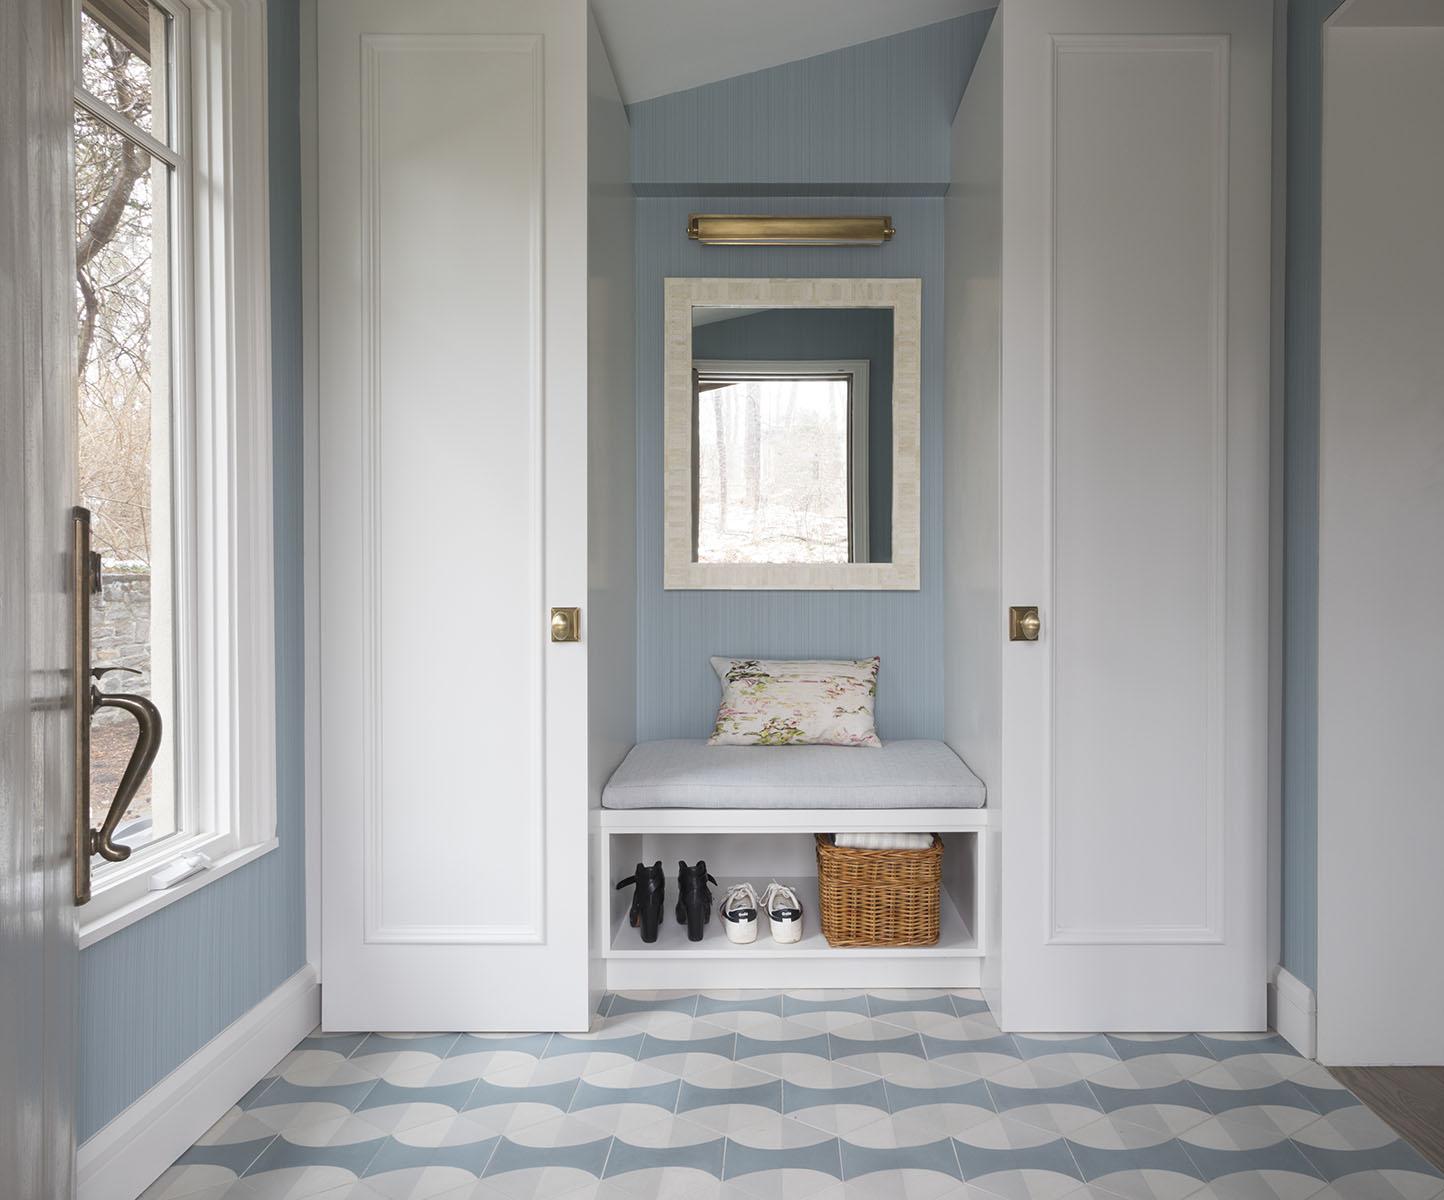 Custom-entry-Bronx-Concrete-Blue-White-Aqua-Tiles-Rag-and-Bone-Boots-Jmorris-Design-Interior-Designer-Brooklyn-Online-Edesign.jpg